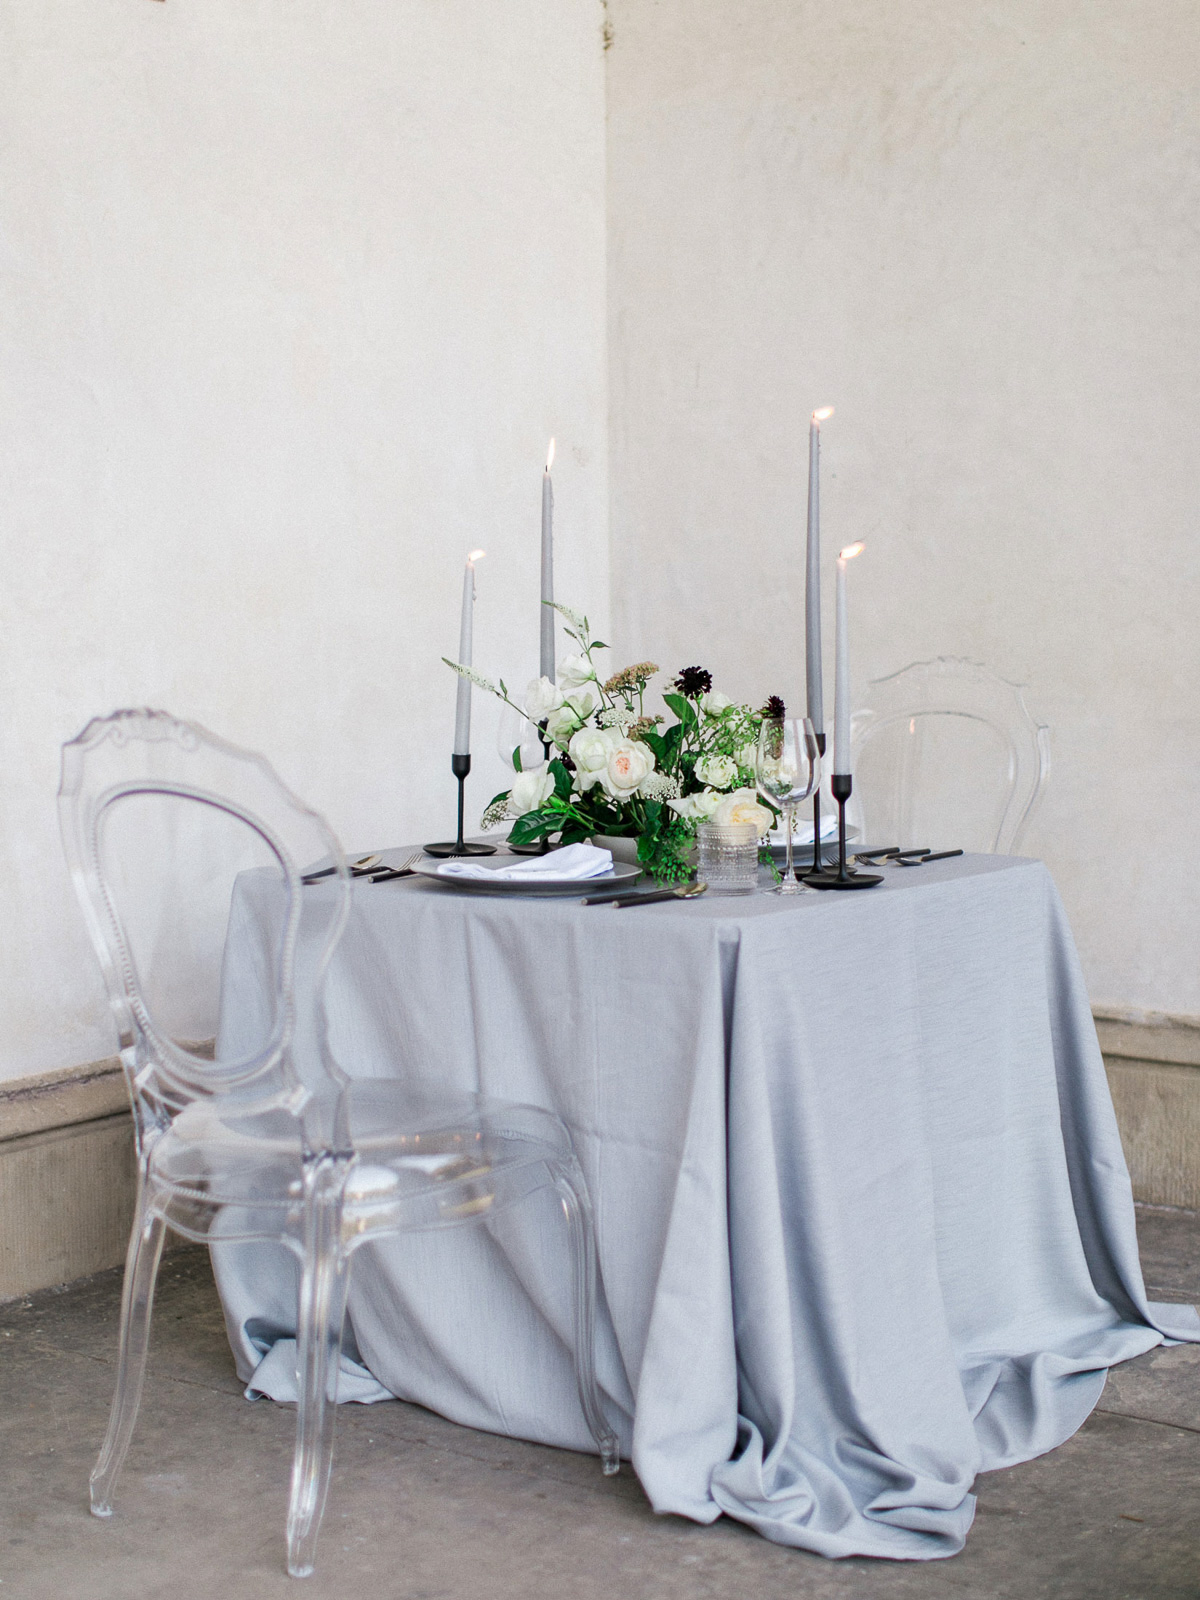 kurtz-orpia-photography-vineyard-bride-swish-list-dundurn-castle-dundas-wedding-editorial-31.jpg